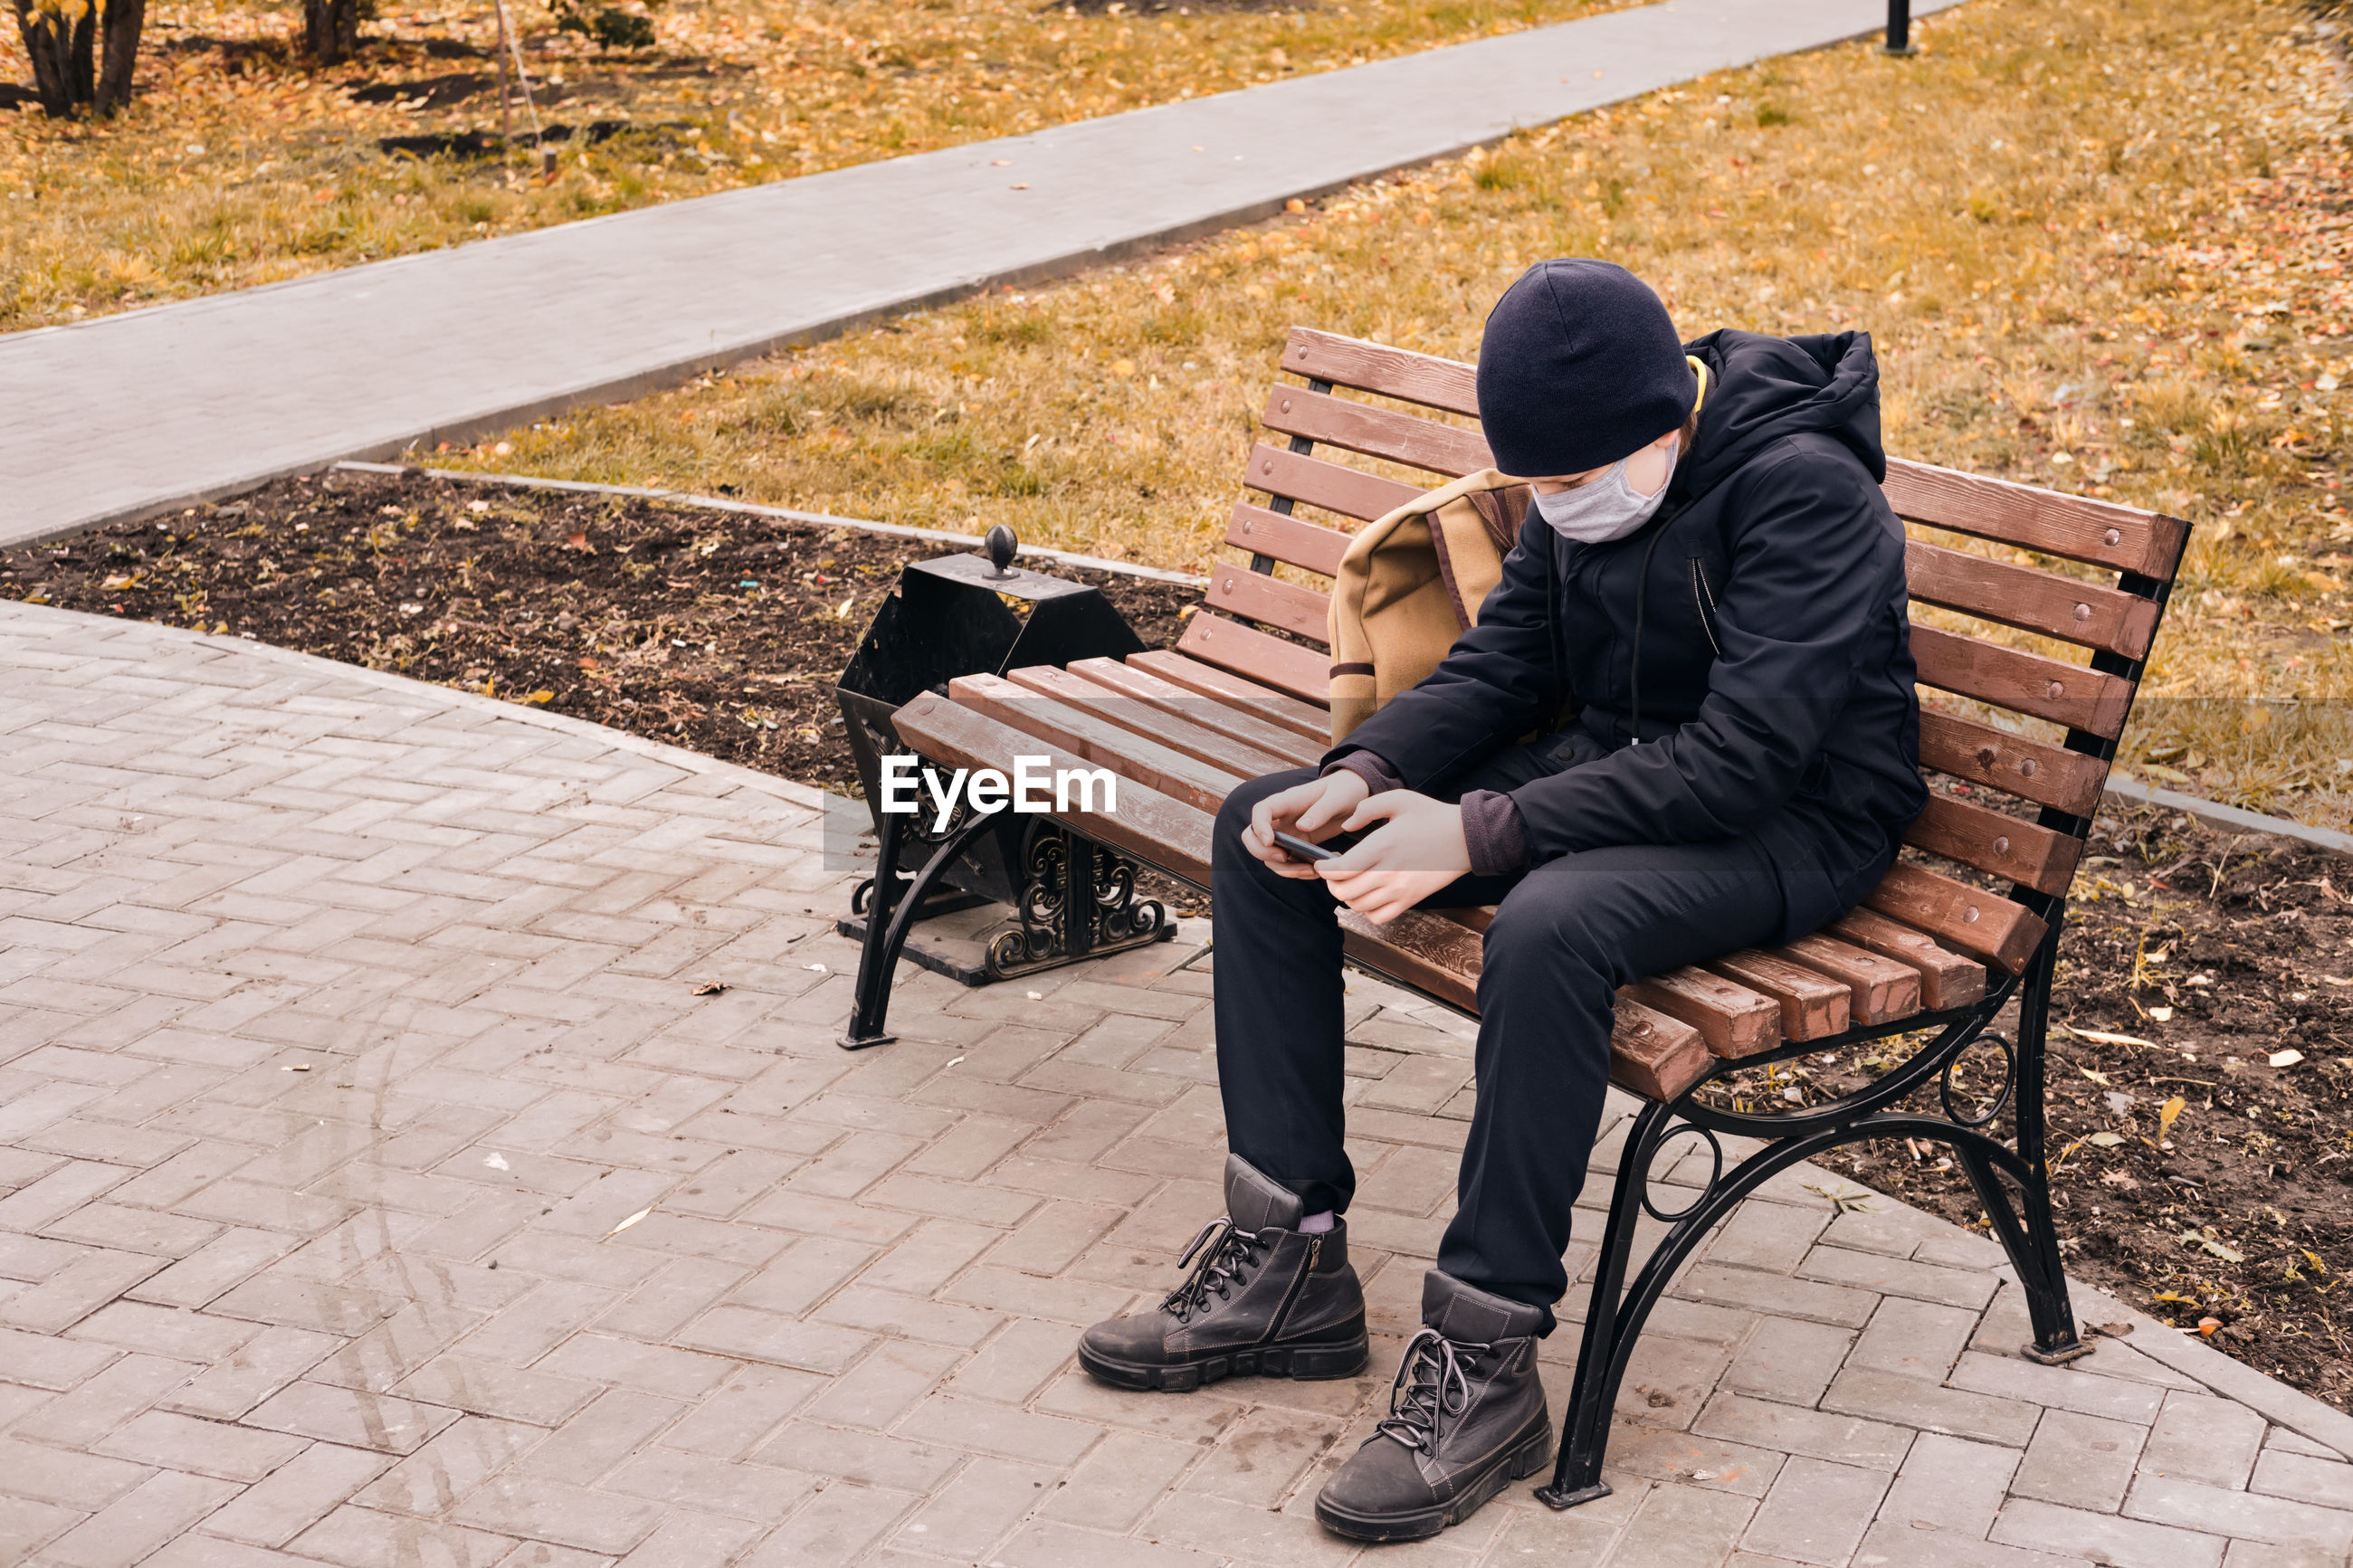 Boy wearing mask using phone sitting on bench at park